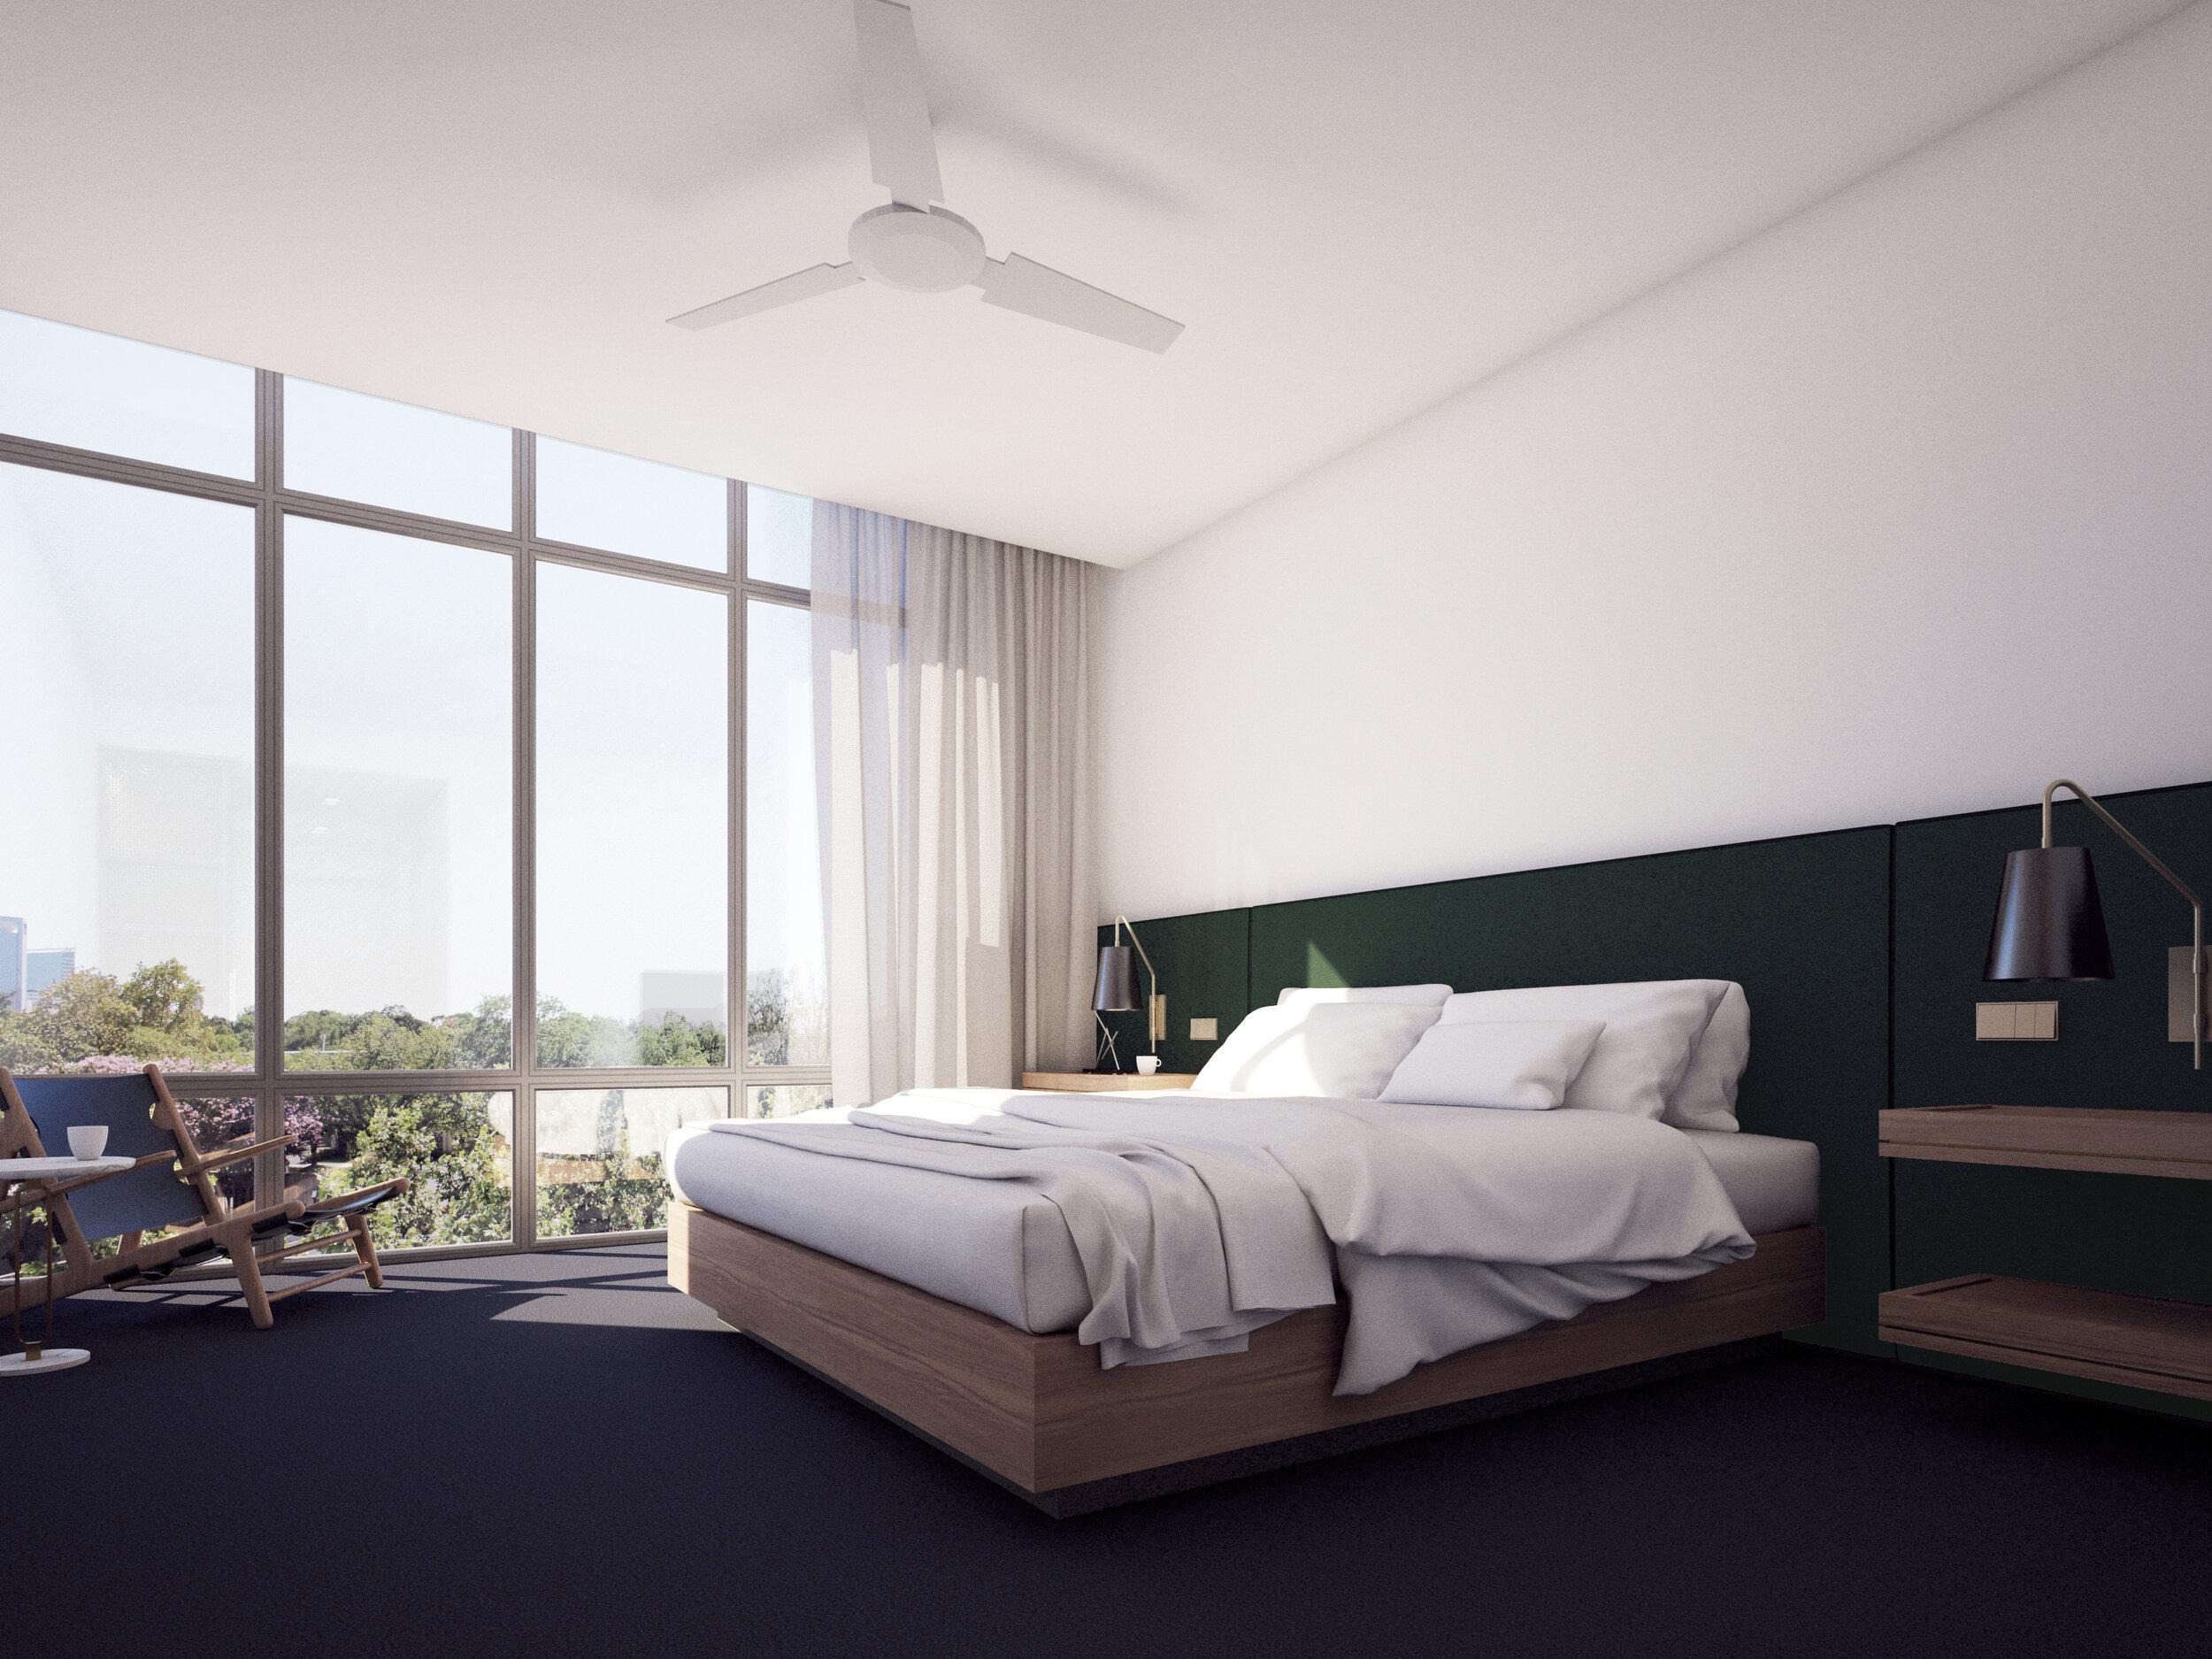 Room+04.jpg?format=2000w